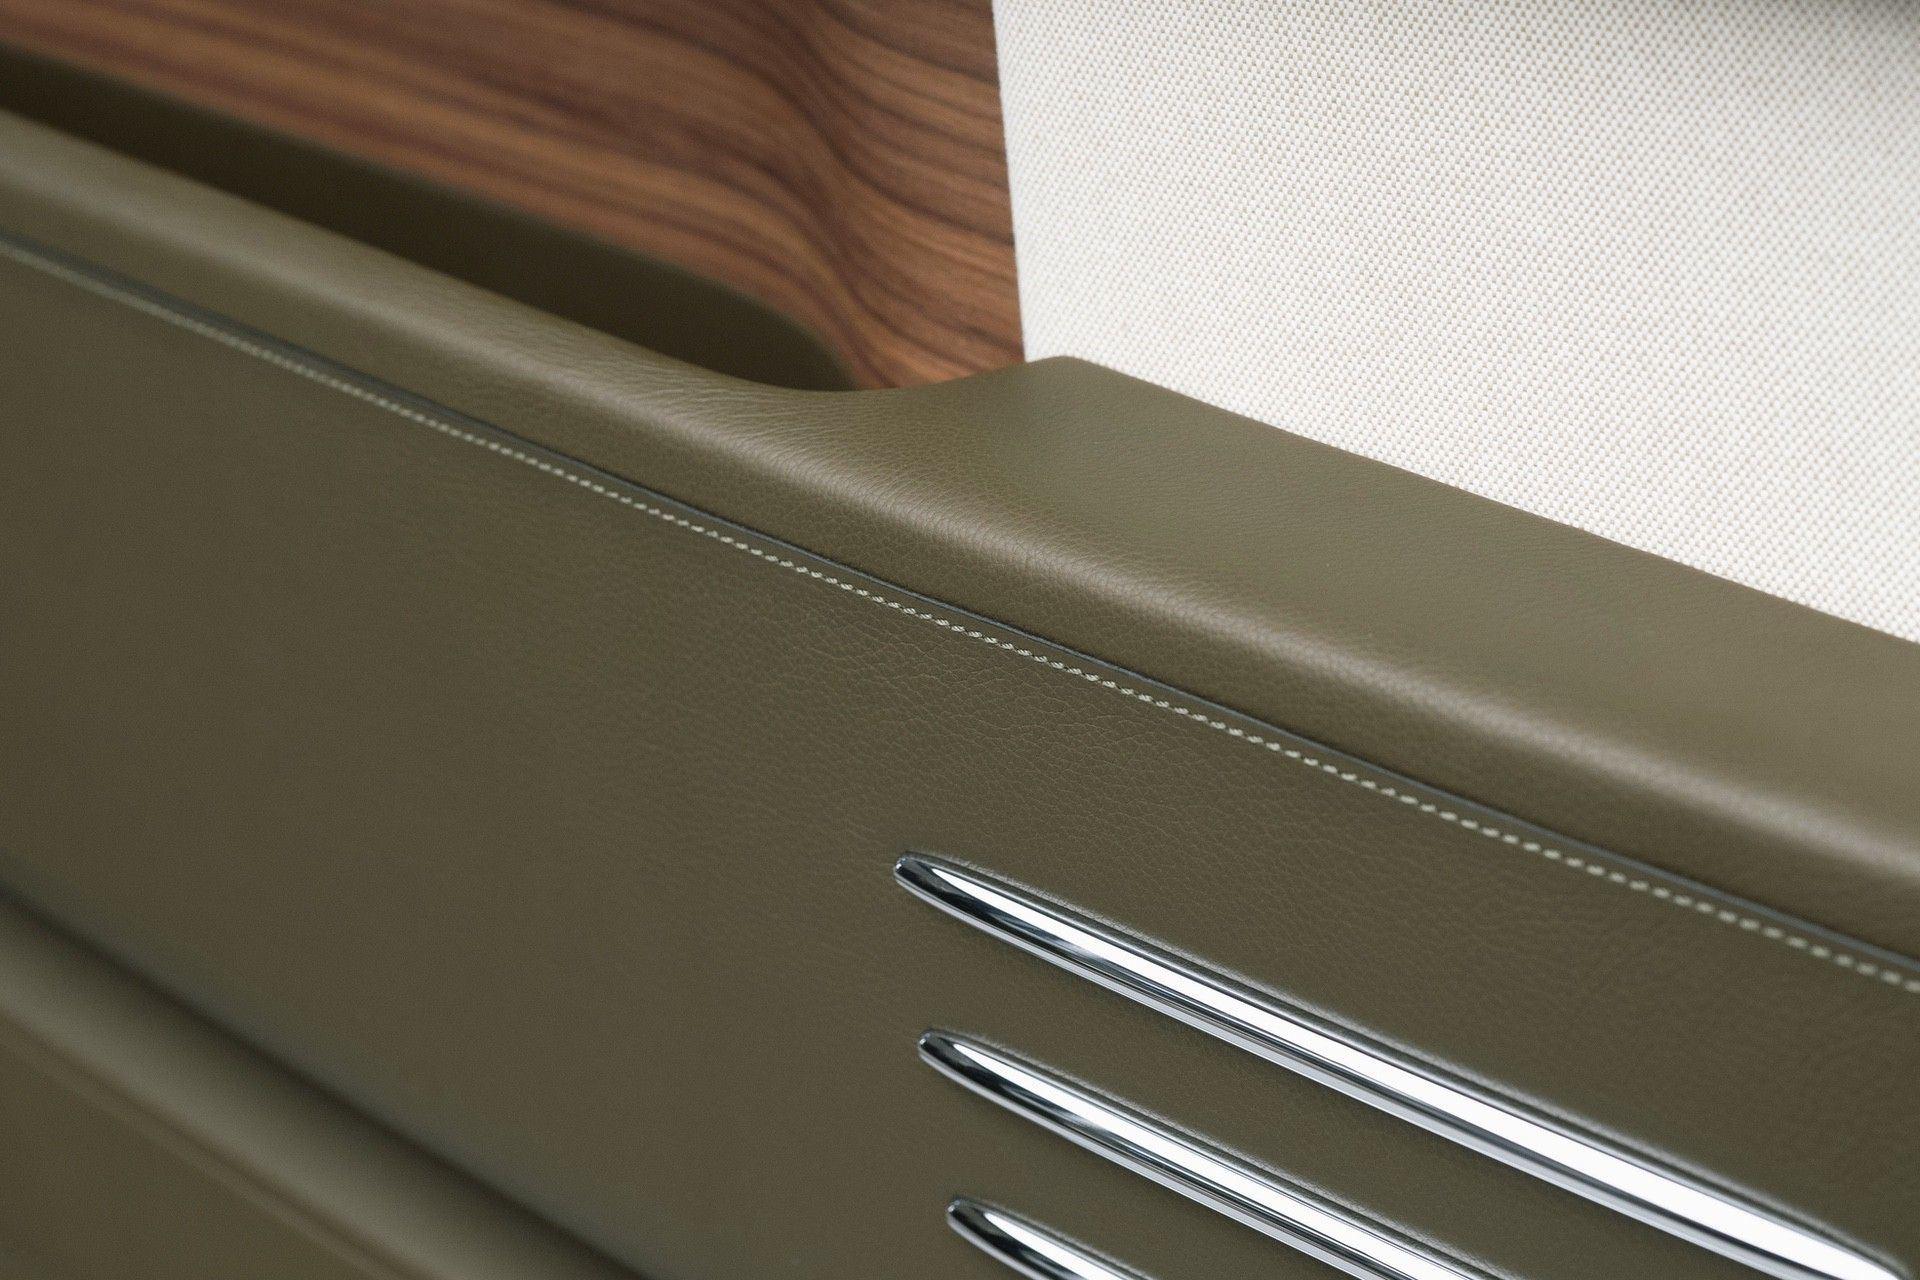 Rolls-Royce_Phantom_Oribe_Hermes-0023